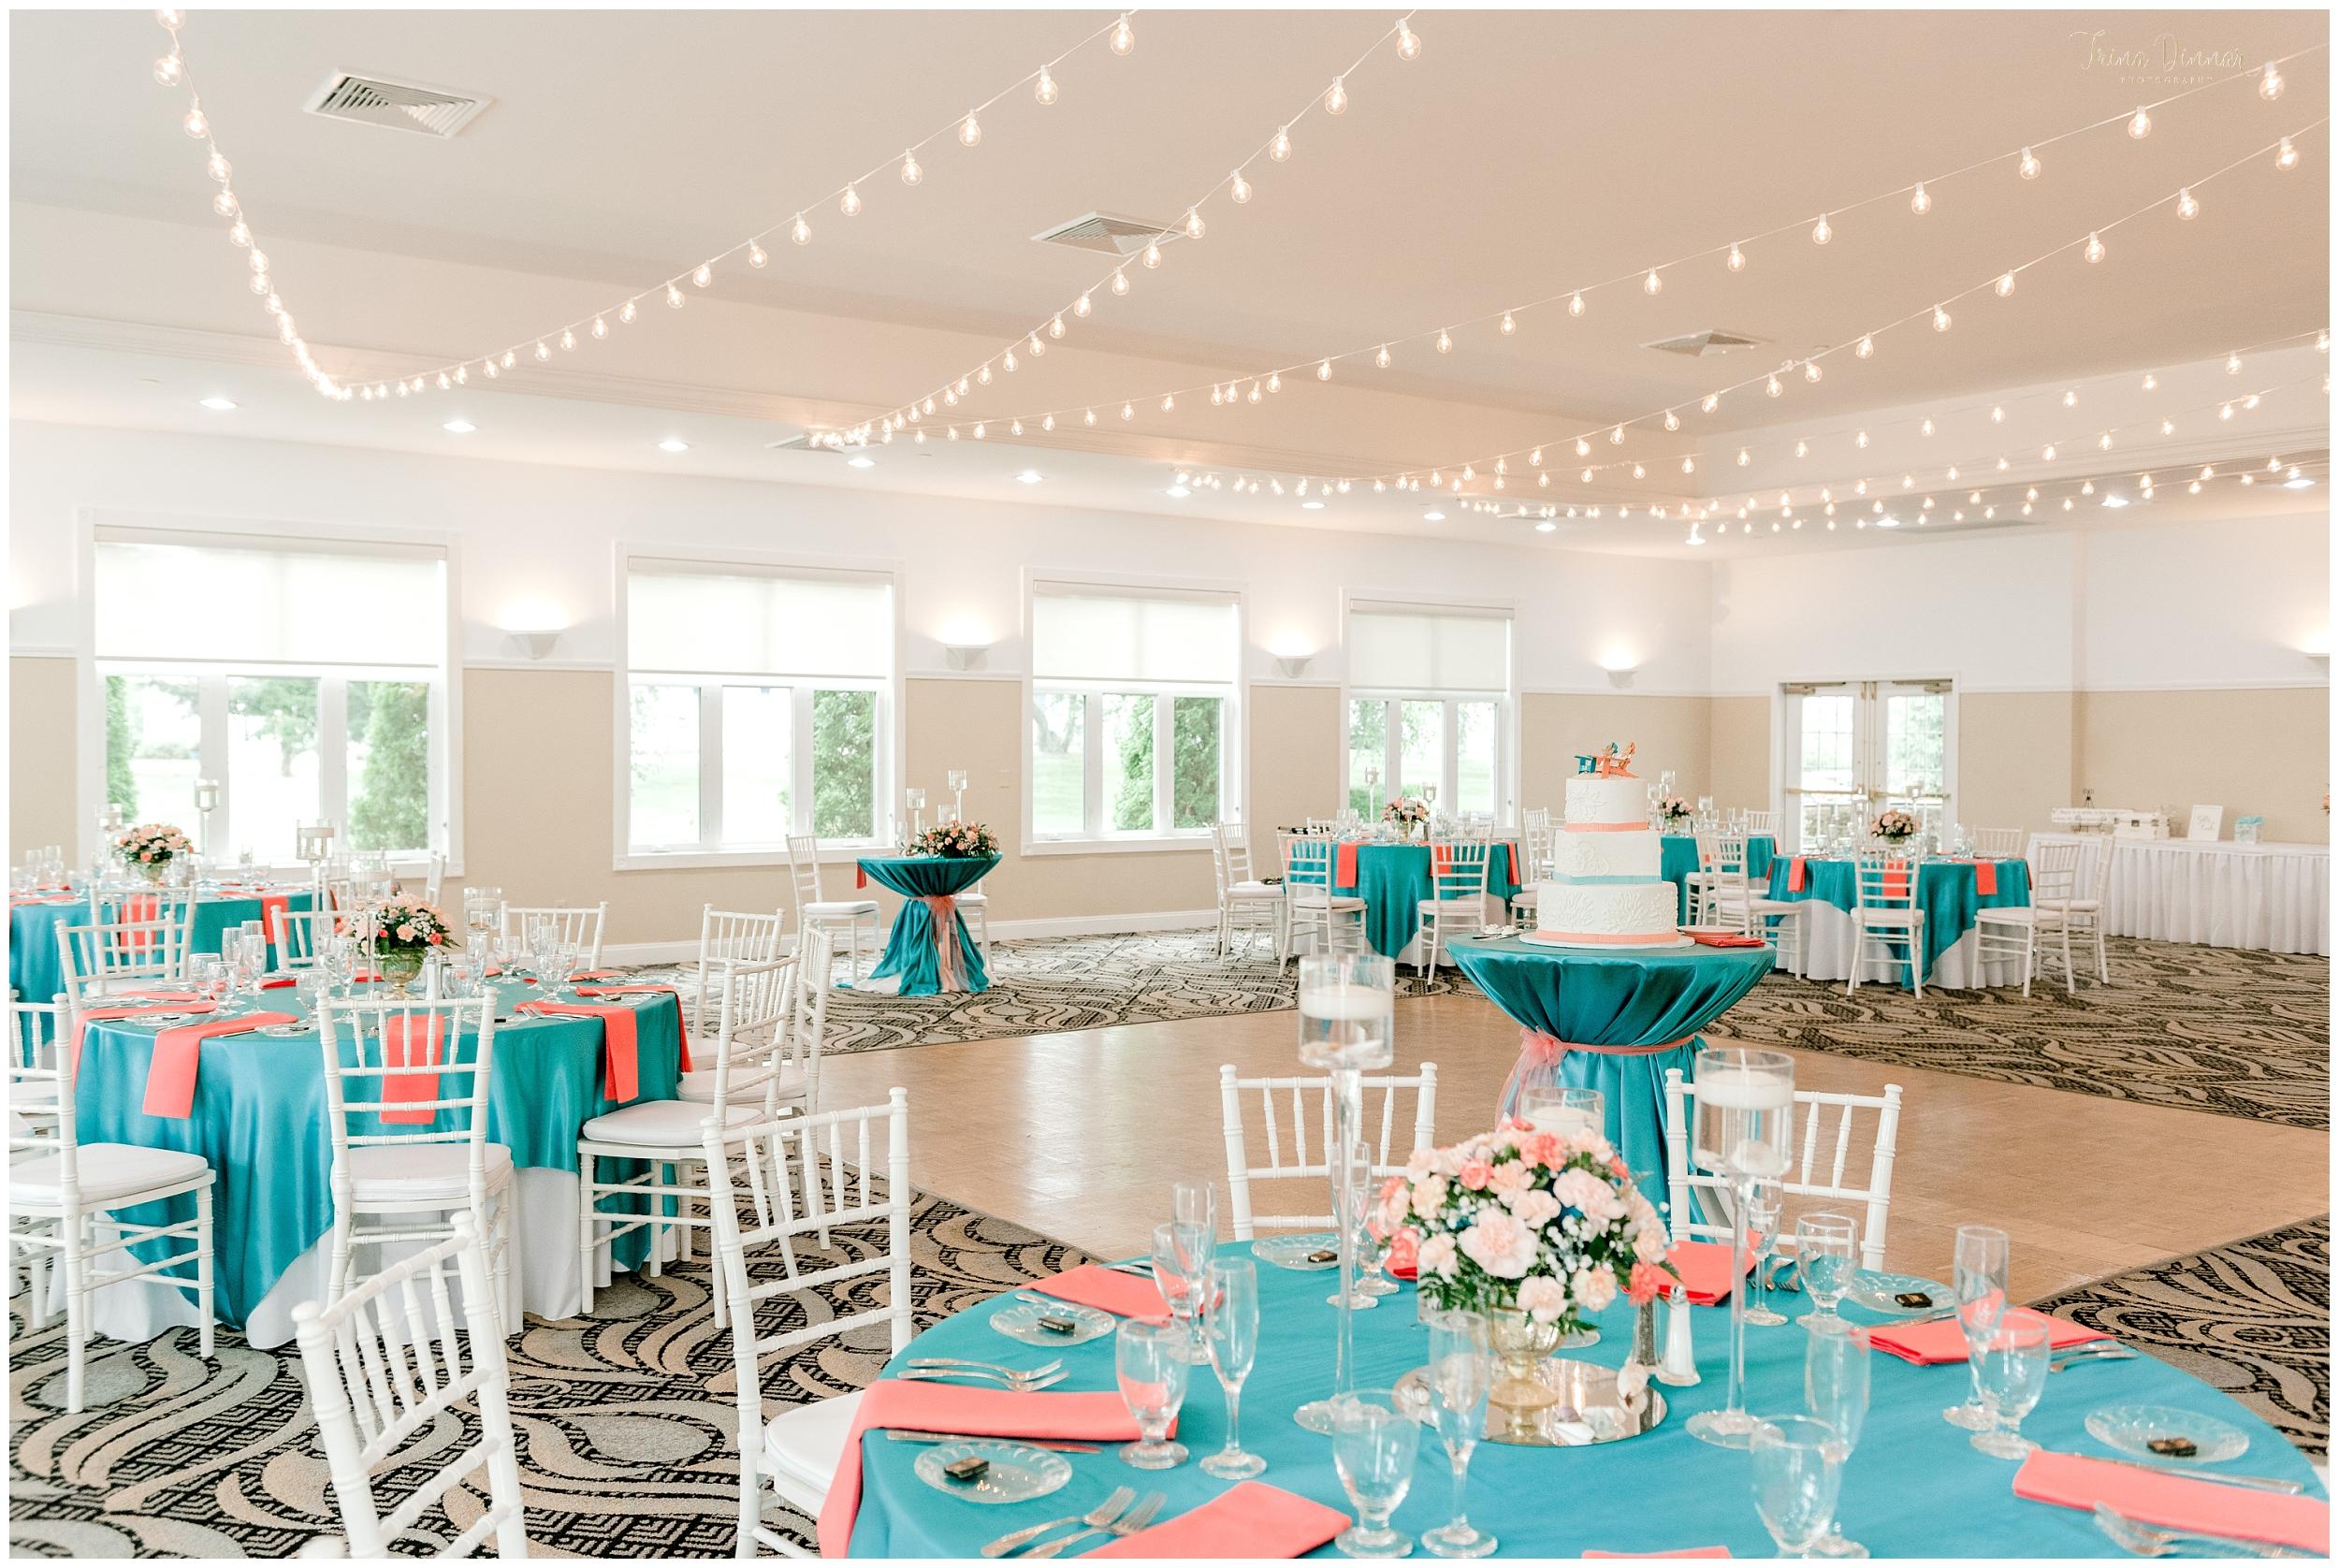 Maine Beach wedding venue in Wells, Maine: Village by the Sea